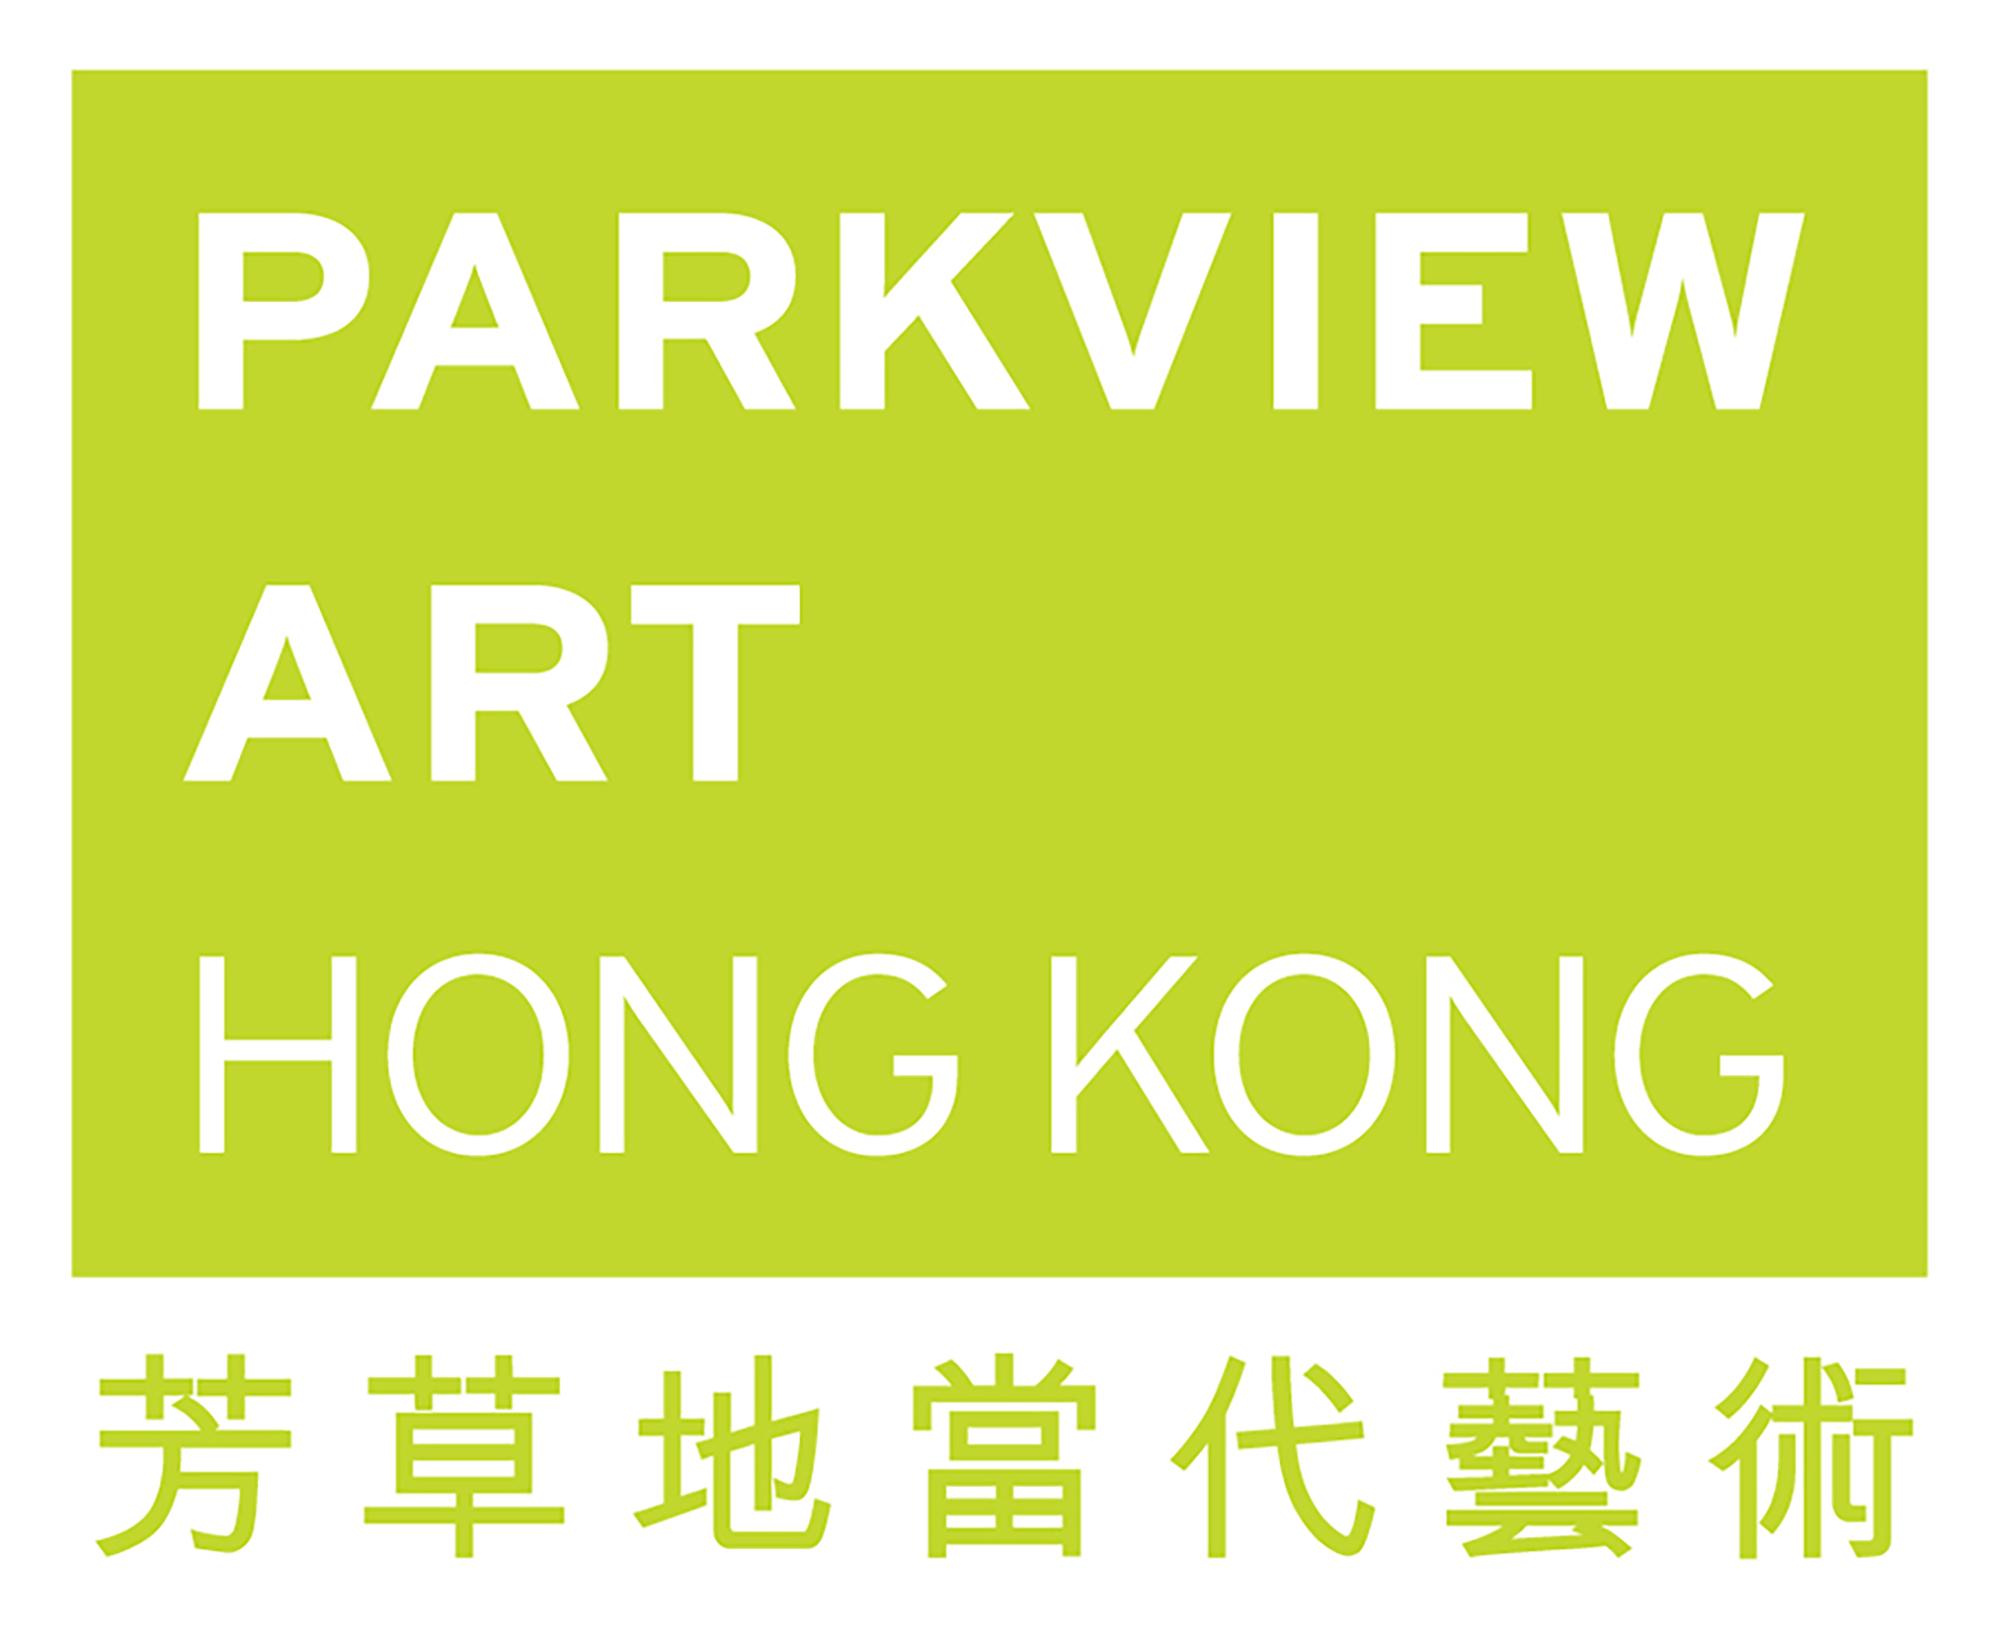 Parkview Art Hong-Kong